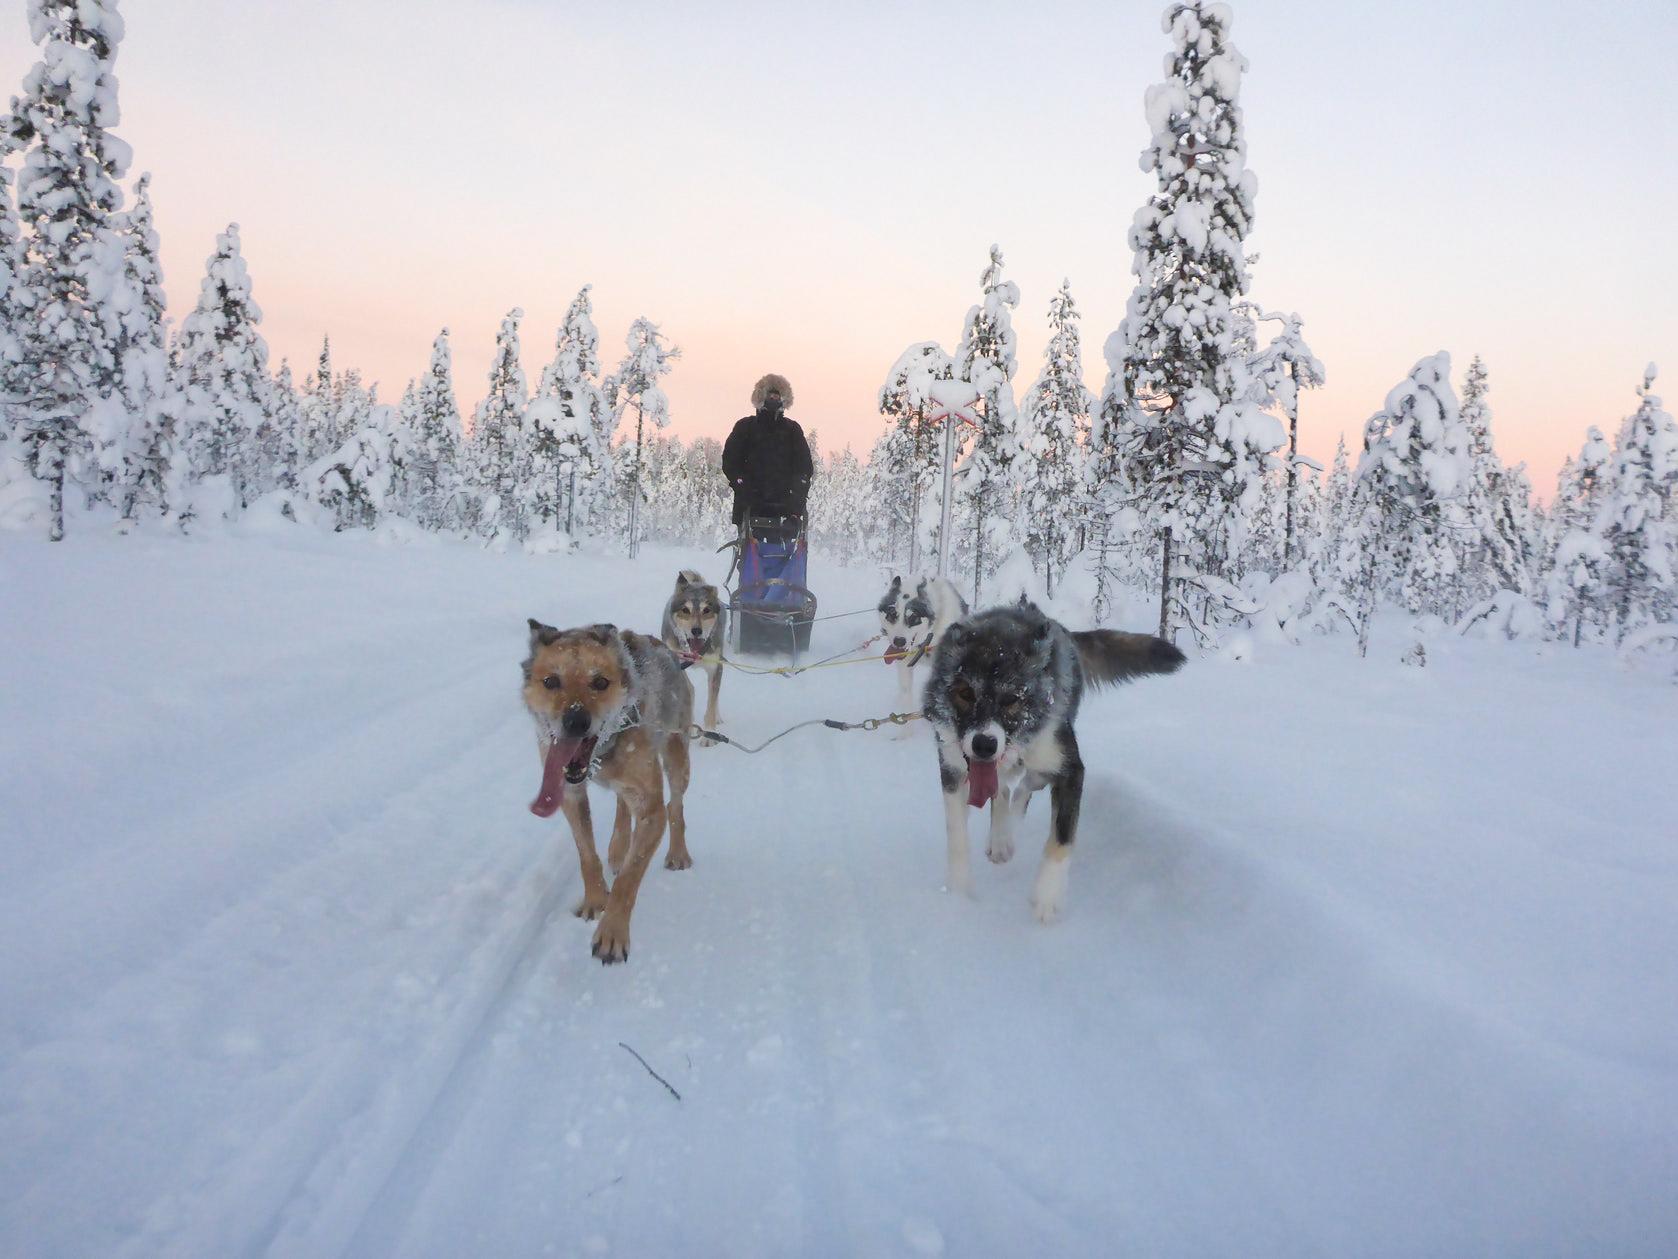 wintertour_snowsleddingsnowshoewalk_6